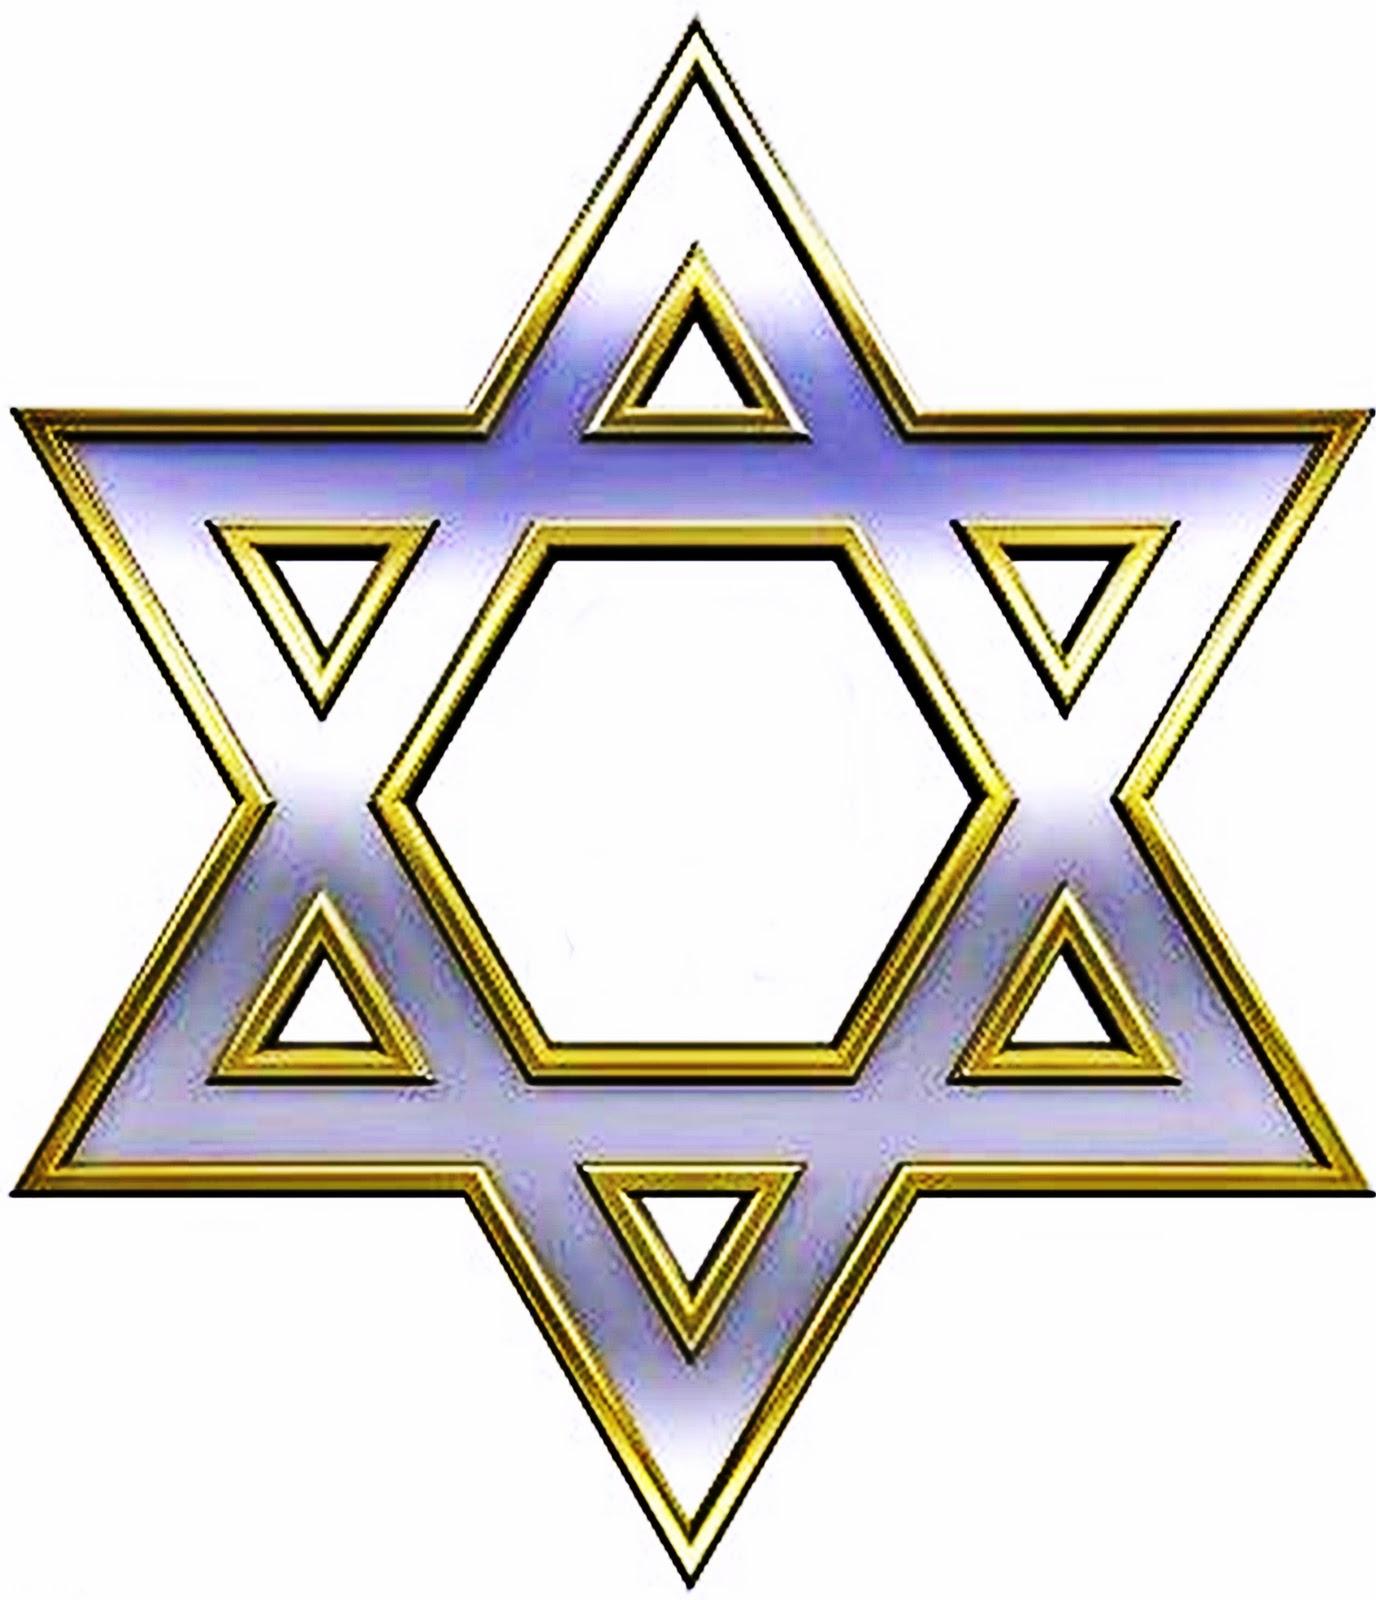 -chrome-con-el-s-mbolo-de-oro-marco-juda-smo-religioso--estrella-de ...